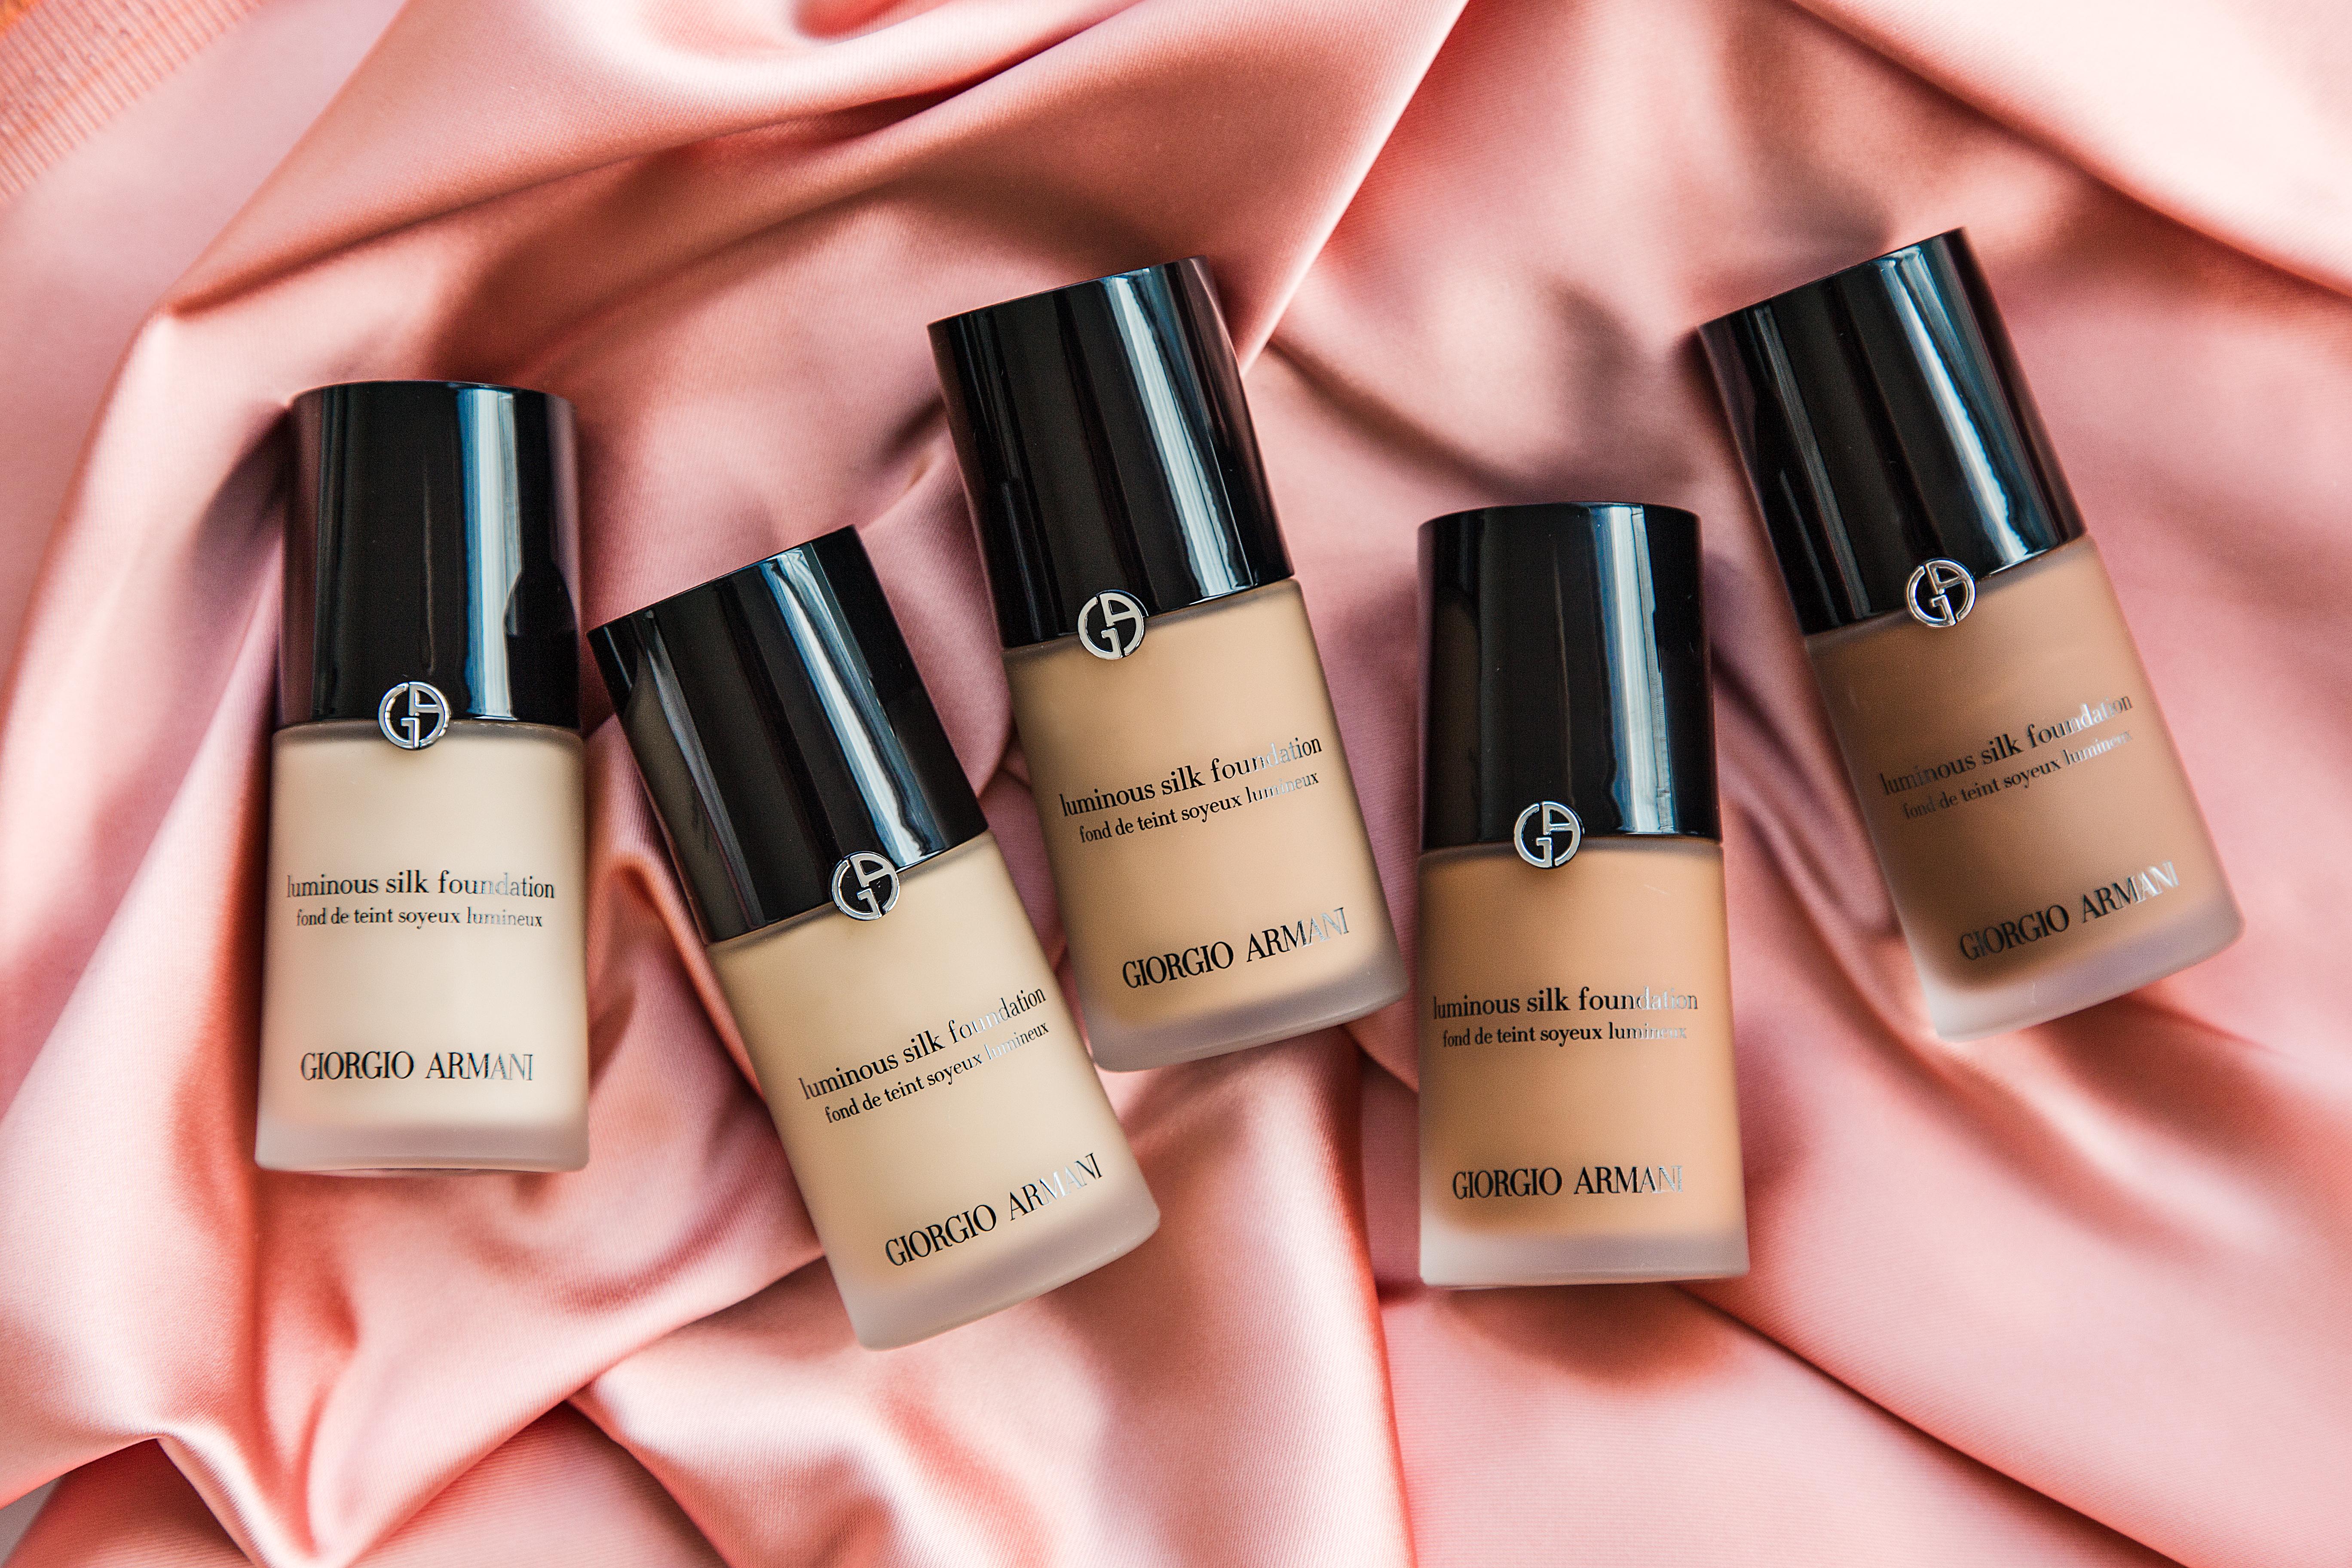 marianna hewitt armani luminous silk foundation review swatch demo first impressions